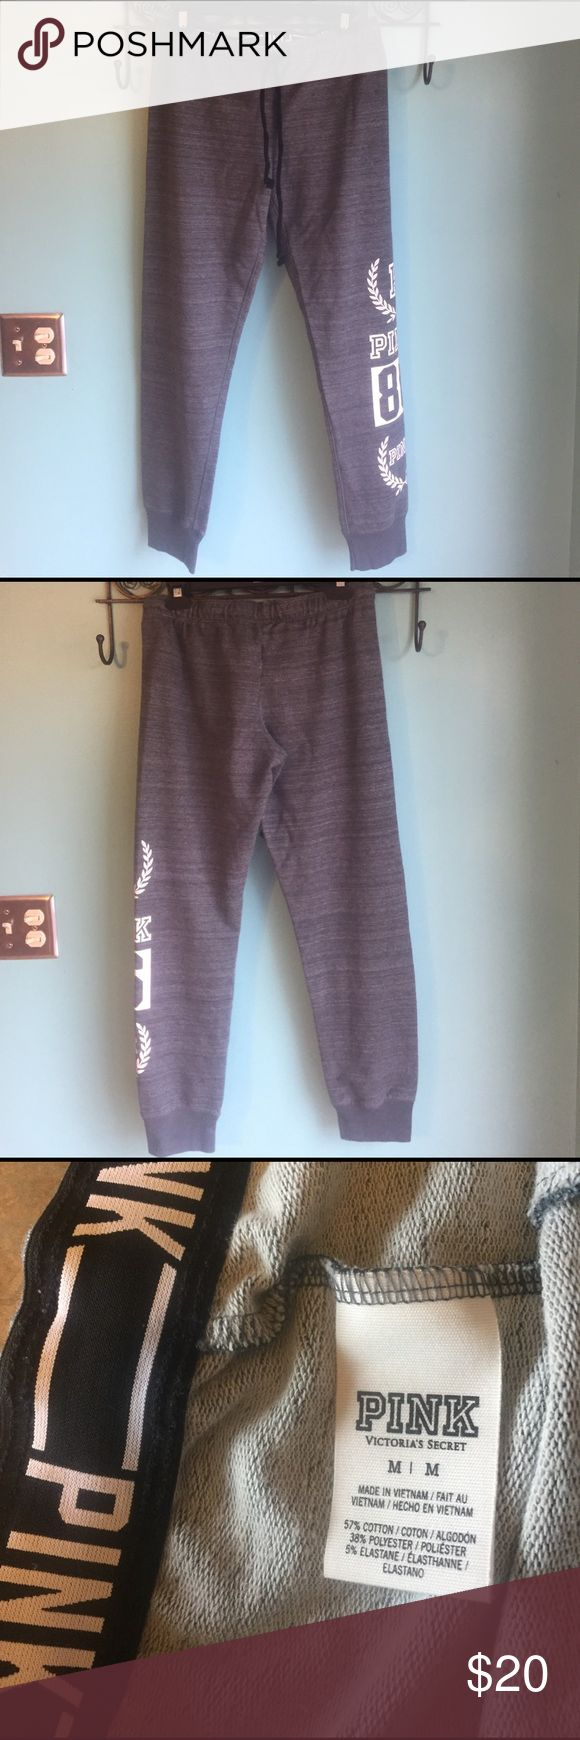 VS PINK Skinny Sweats NWOT Dark Grey Marled Sz M VS PINK Skinny Sweats NWOT Dark Grey Marled Sz Medium PINK Victoria's Secret Pants Track Pants & Joggers